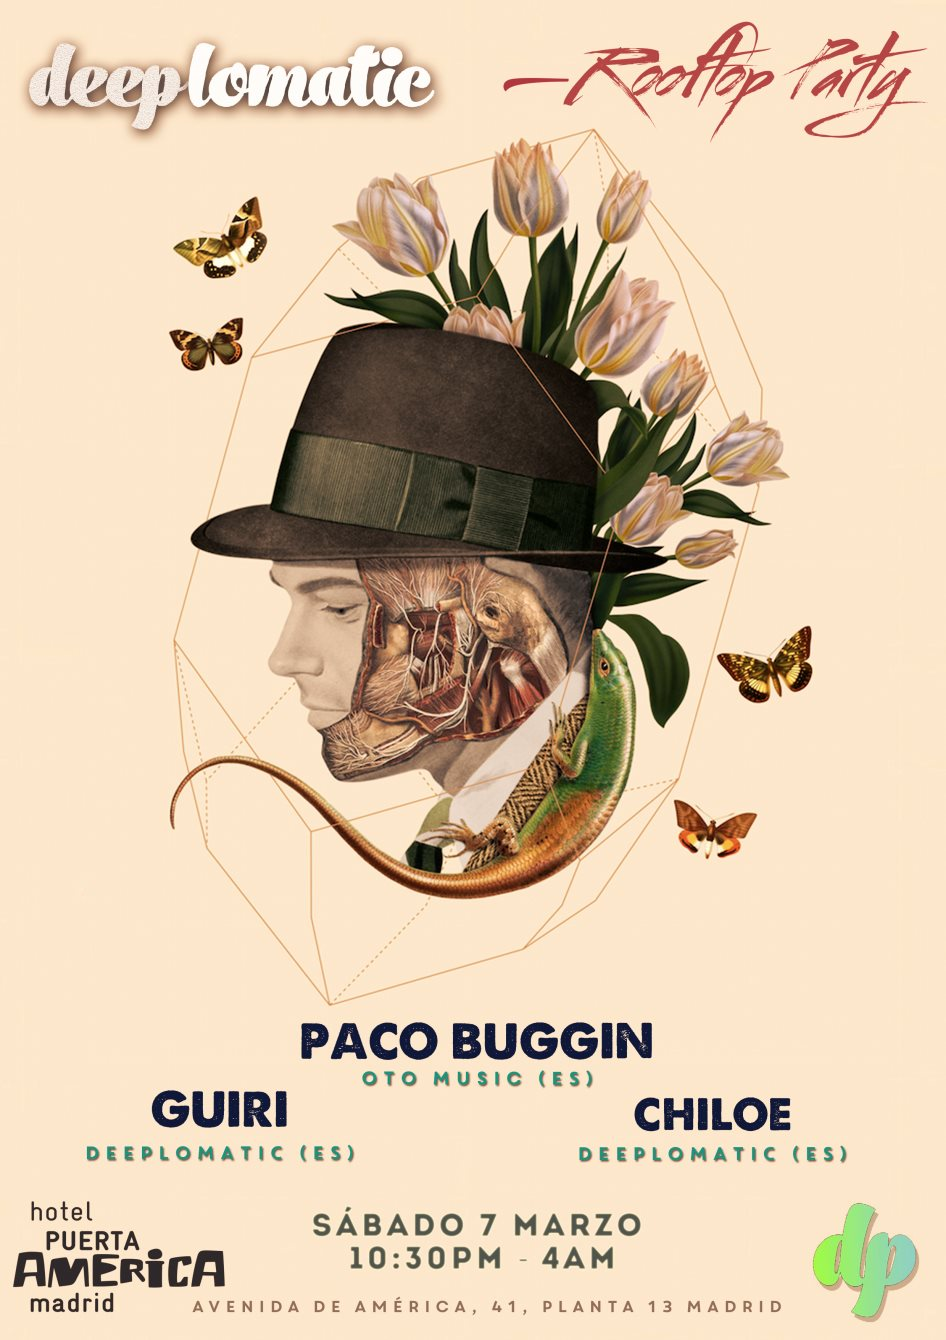 Paco Buggin